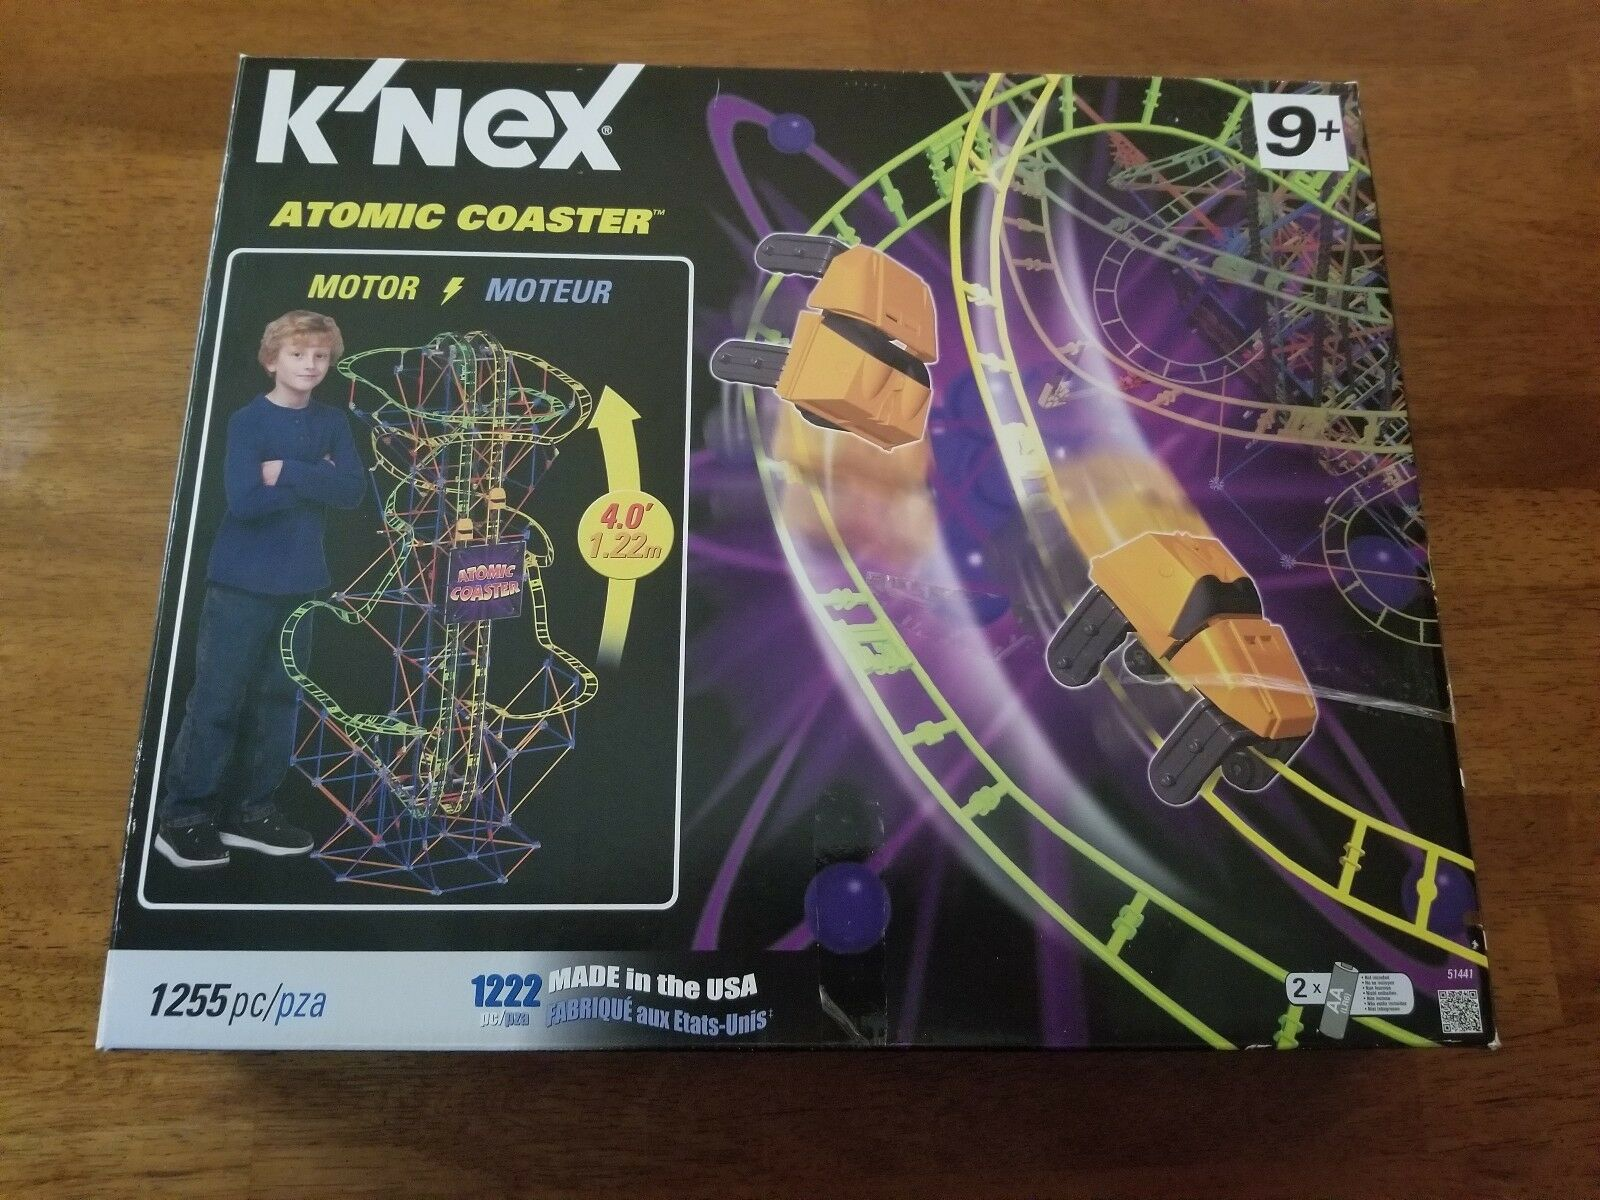 K'NEX Atomic Coaster Building Set Motorized 4' High 2012 COMPLETE